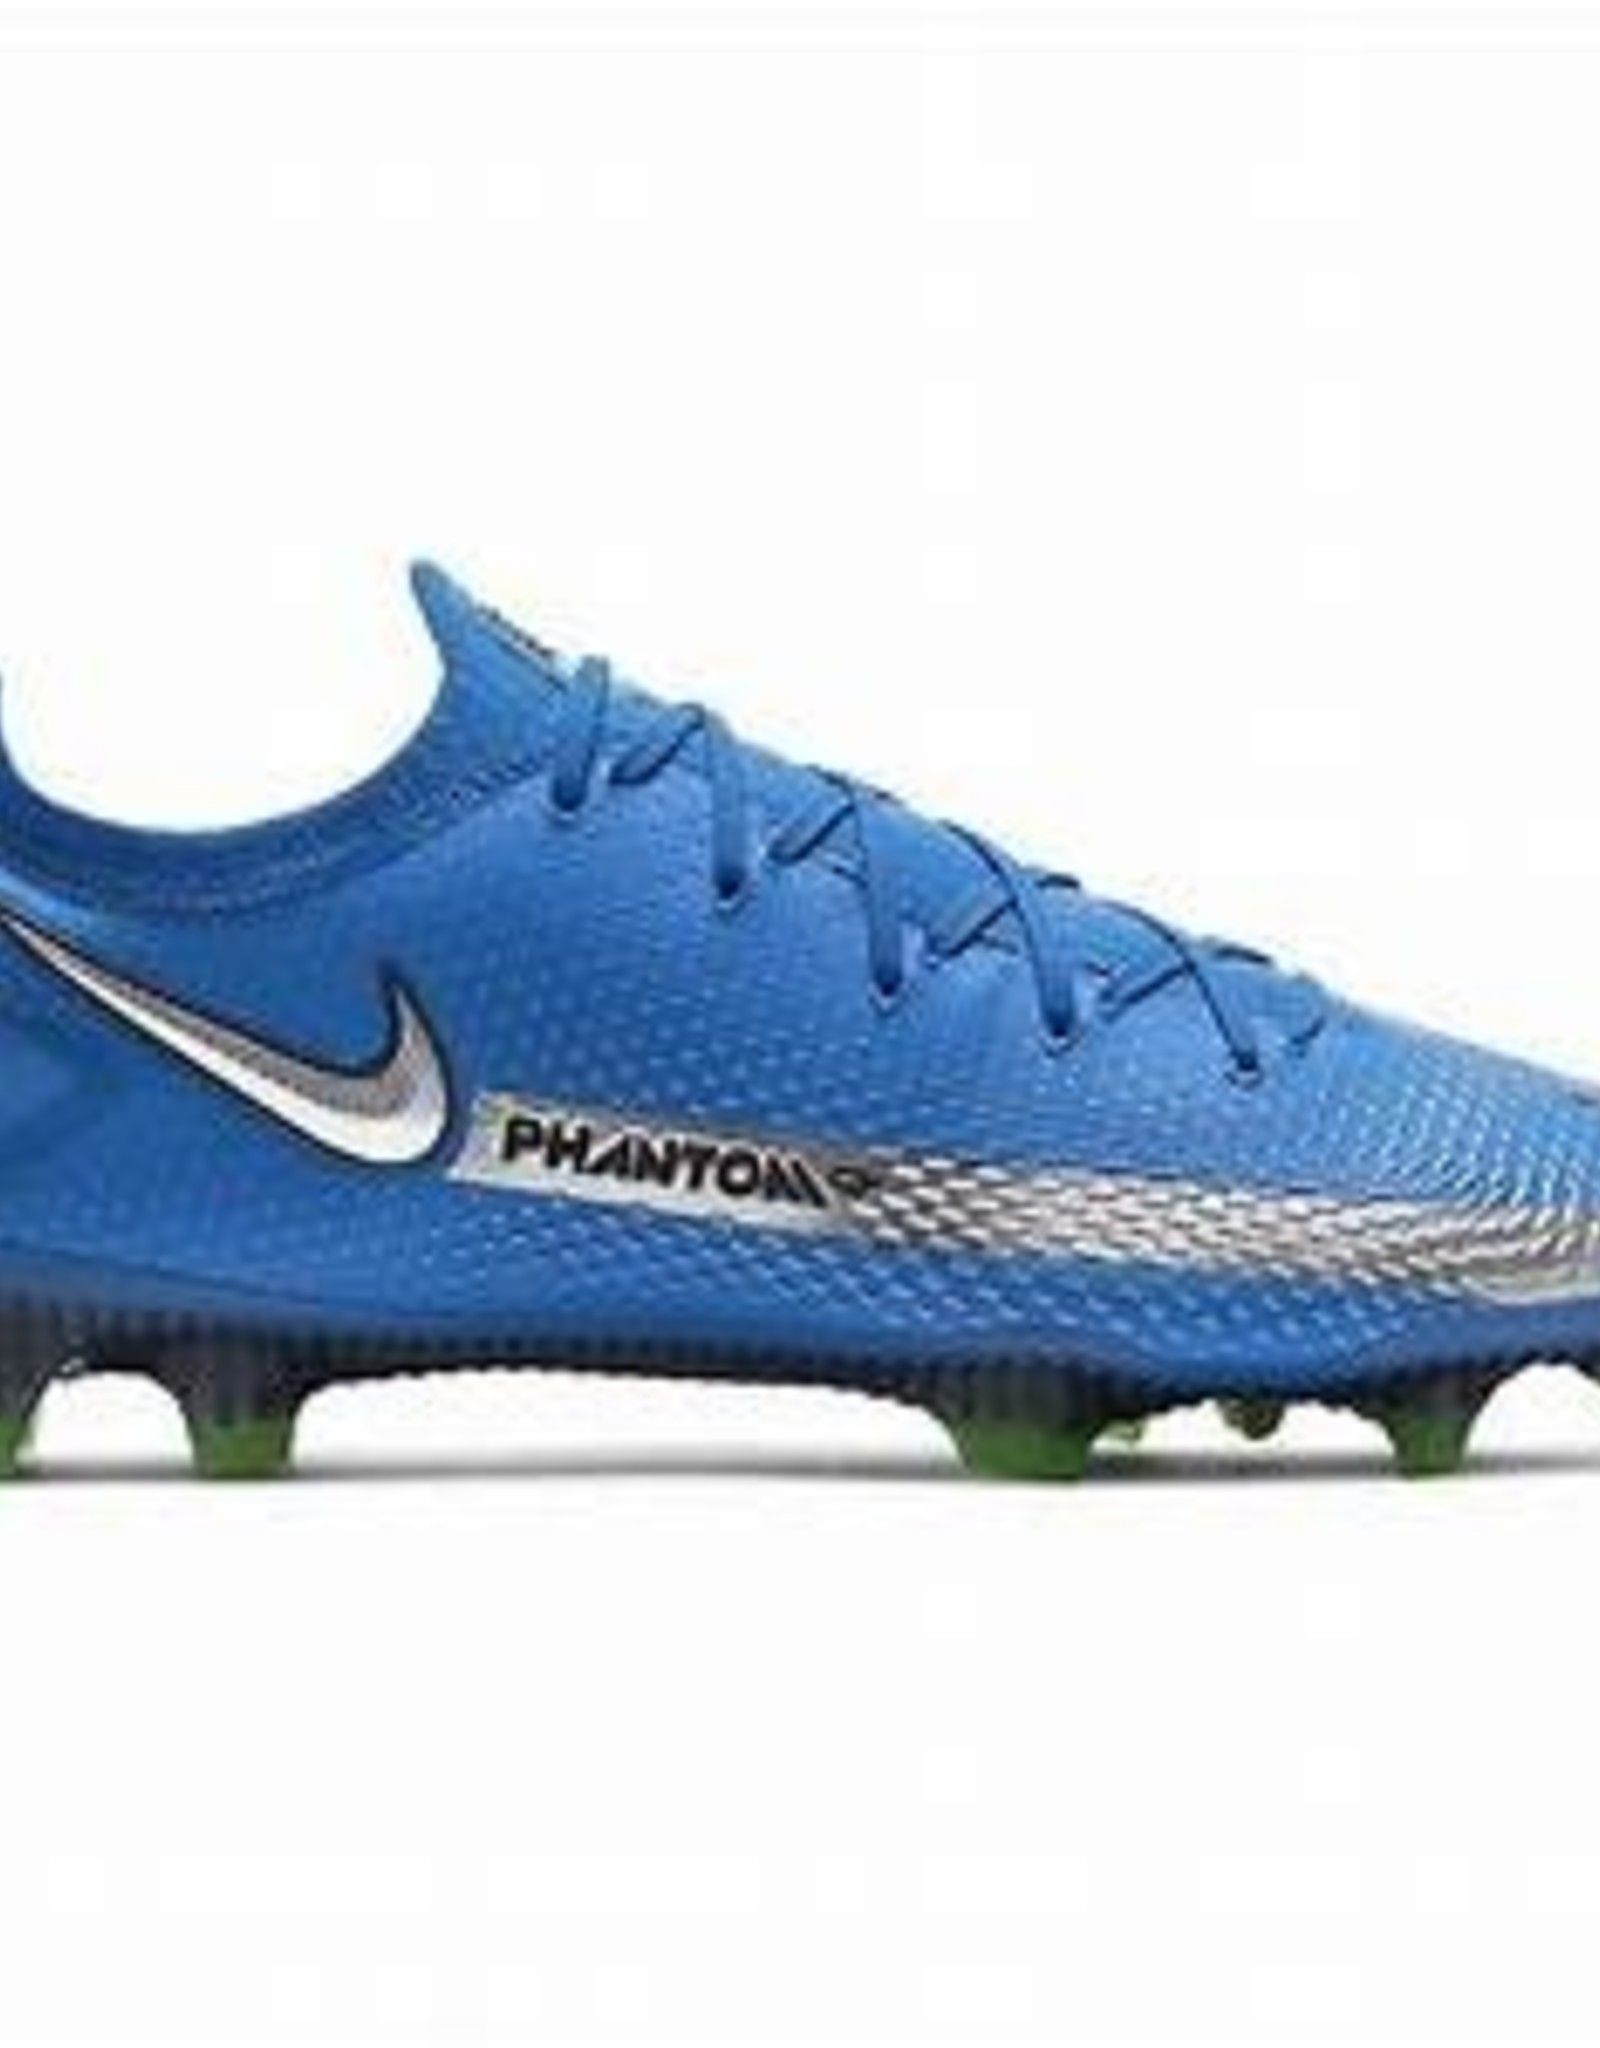 Nike  FG Phantom GT Elite photo blue